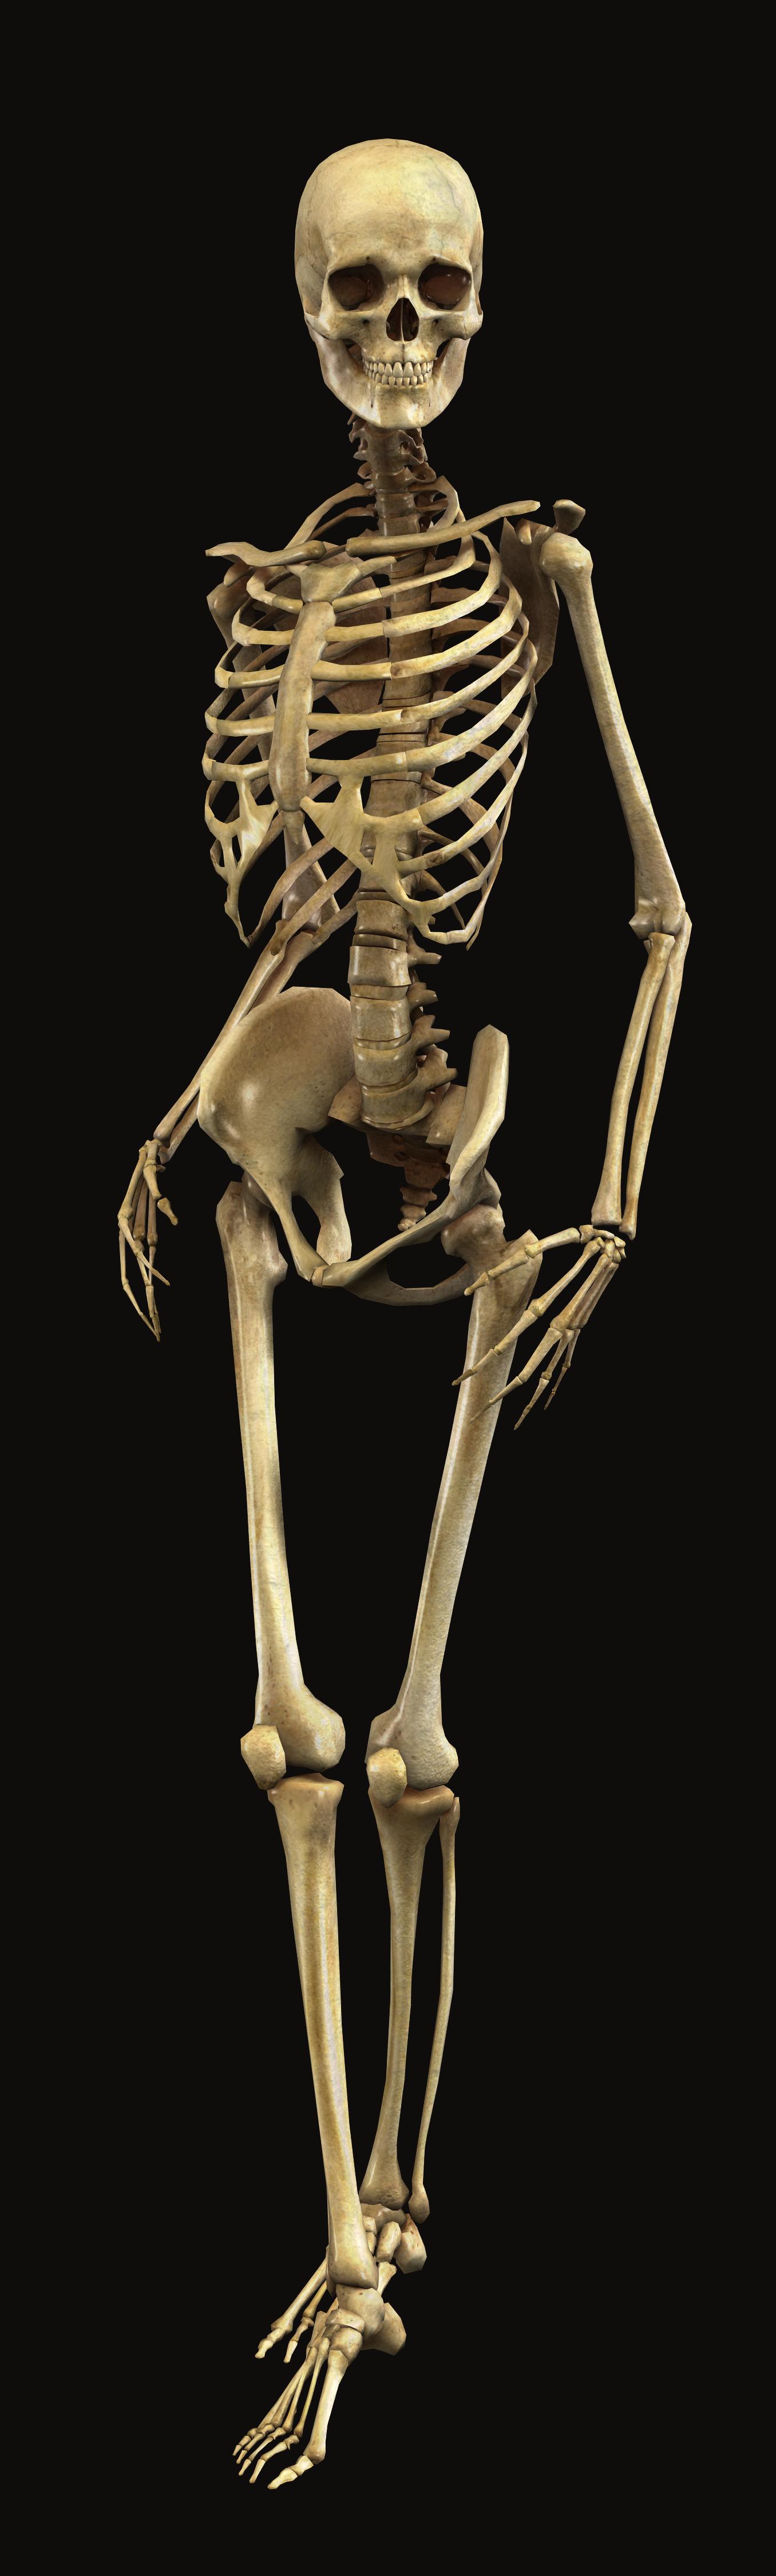 image - full-3d-human-skeleton-bryan-brandenburg | villains, Skeleton